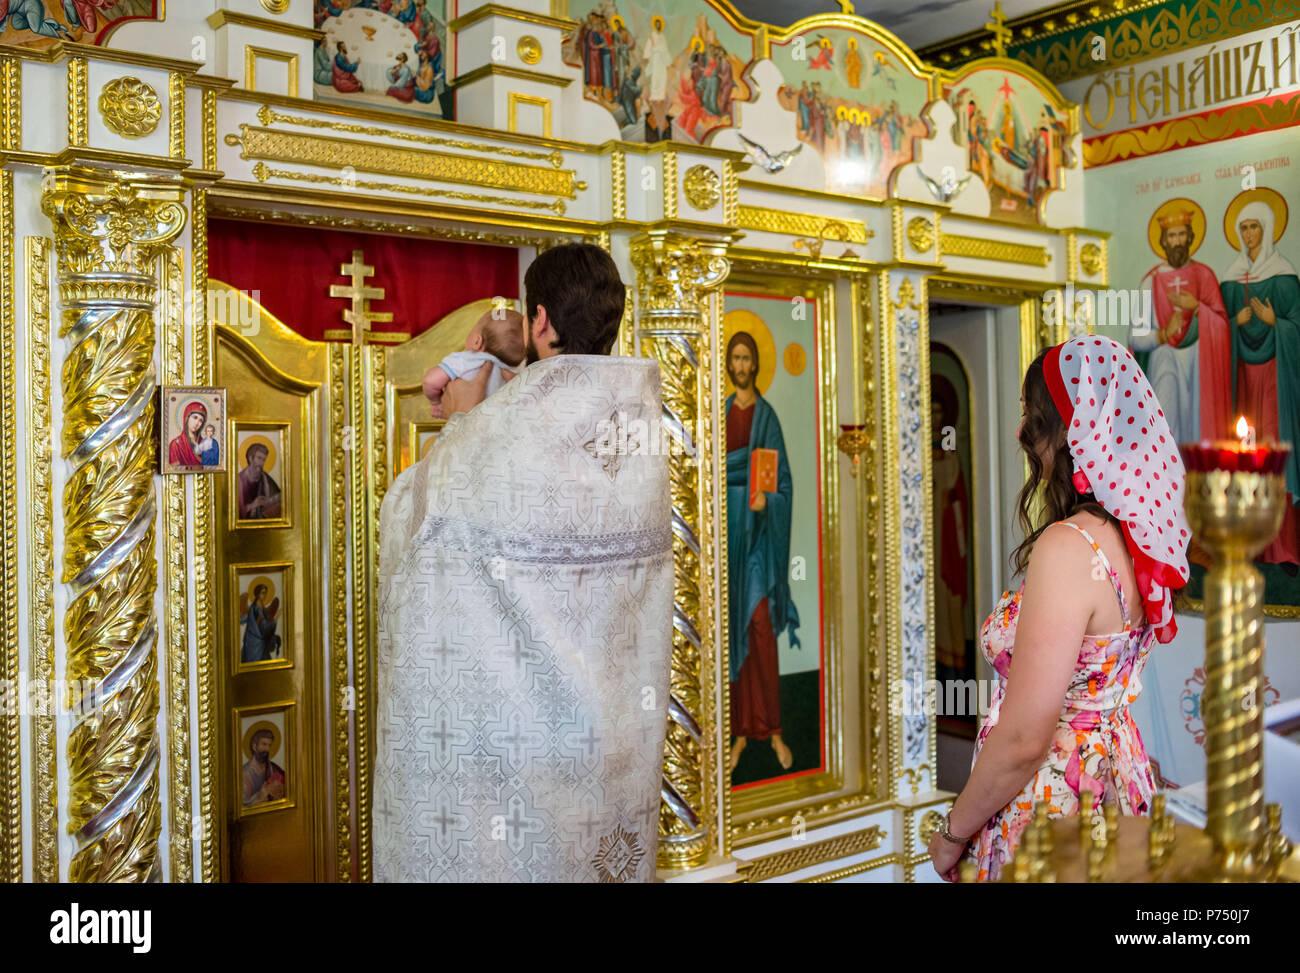 Odessa, Ukraine. July 27, 2017. The Church. Sacrament of Baptism Church. heavenly gates. - Stock Image